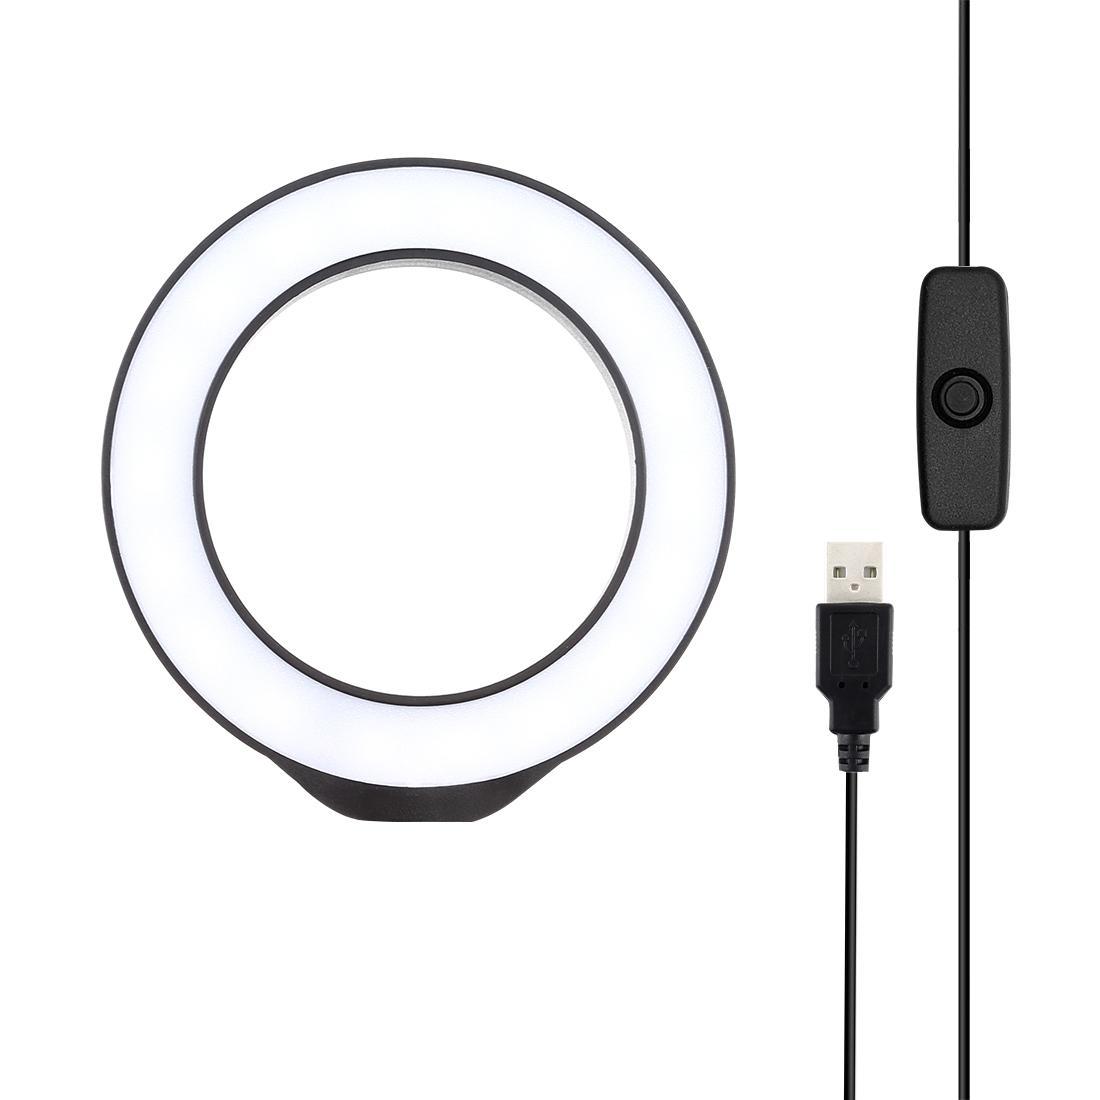 PULUZ 4.7 inch 12cm USB White Light LED Ring Vlogging Photography Video Lights